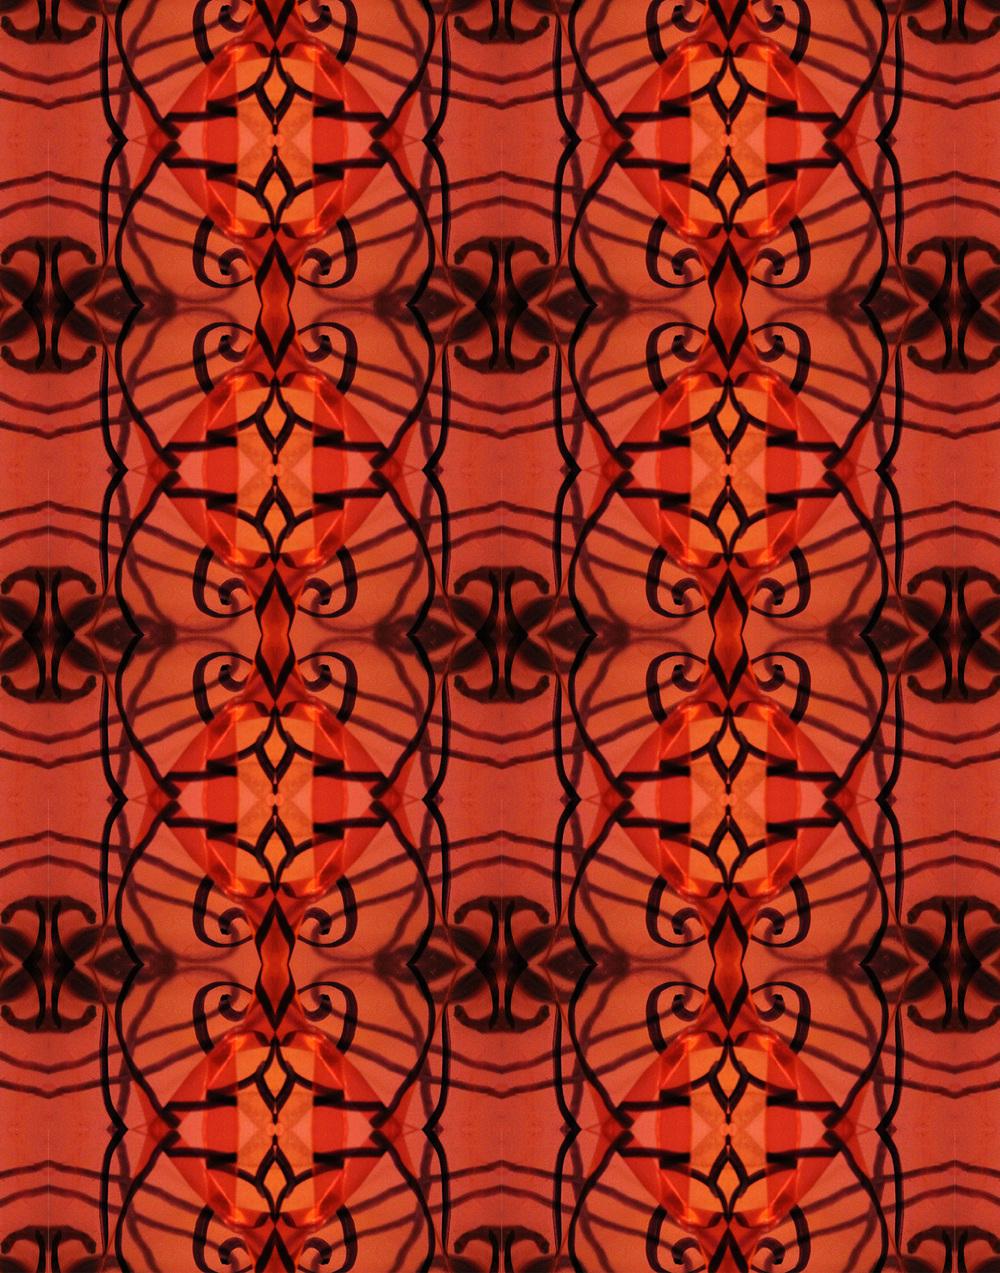 ironwork_pattern.jpg